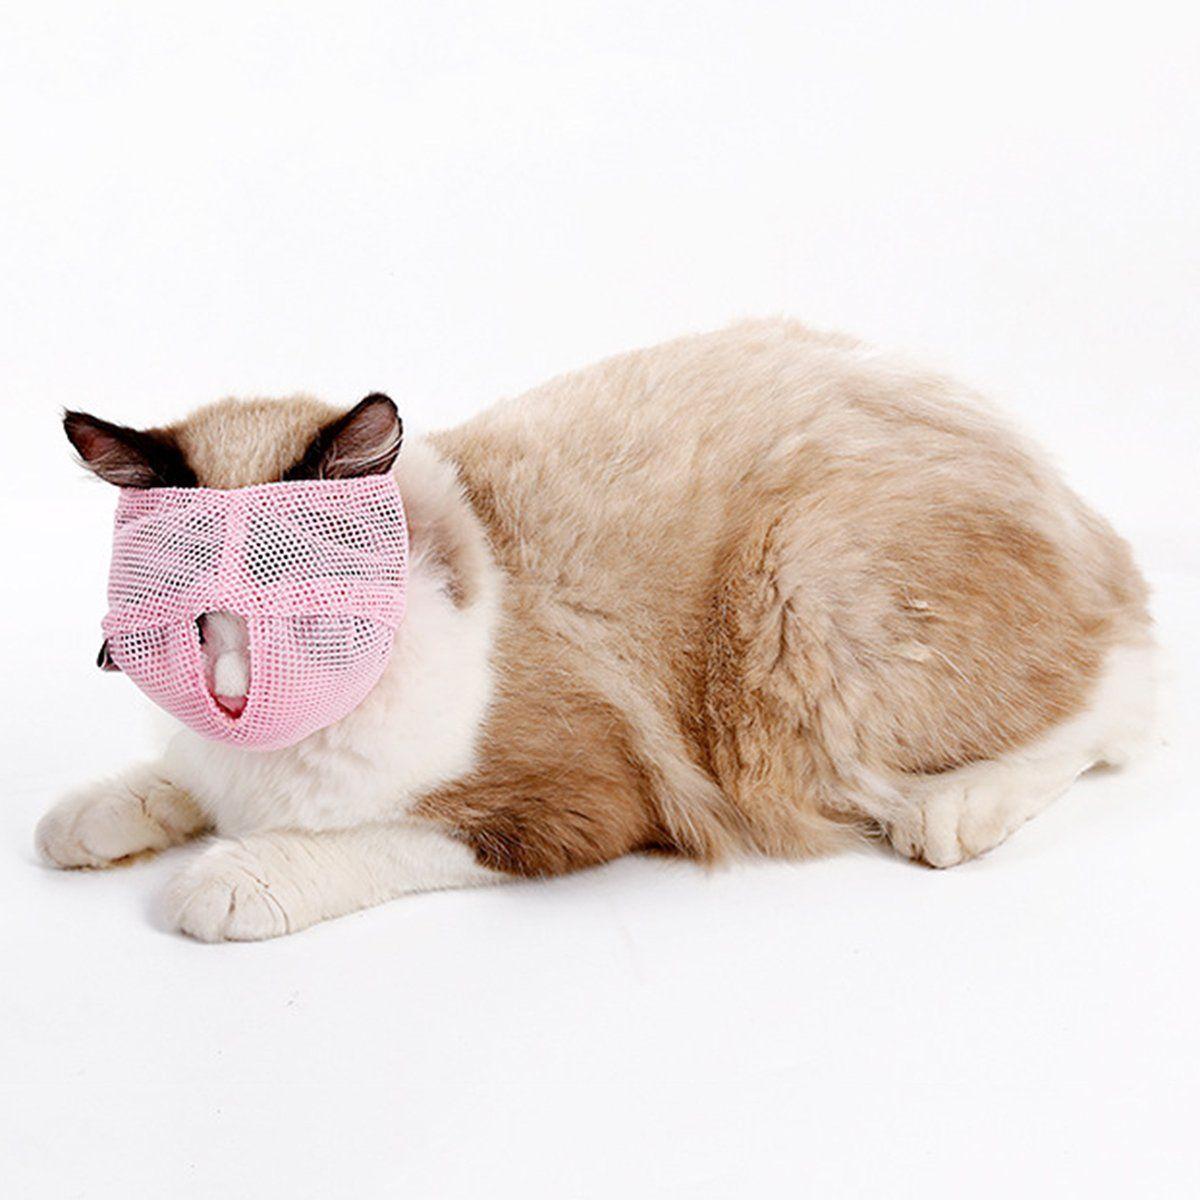 Hospital Bag Uheng Pet Cat Muzzles Breathable Mesh Anti Biting